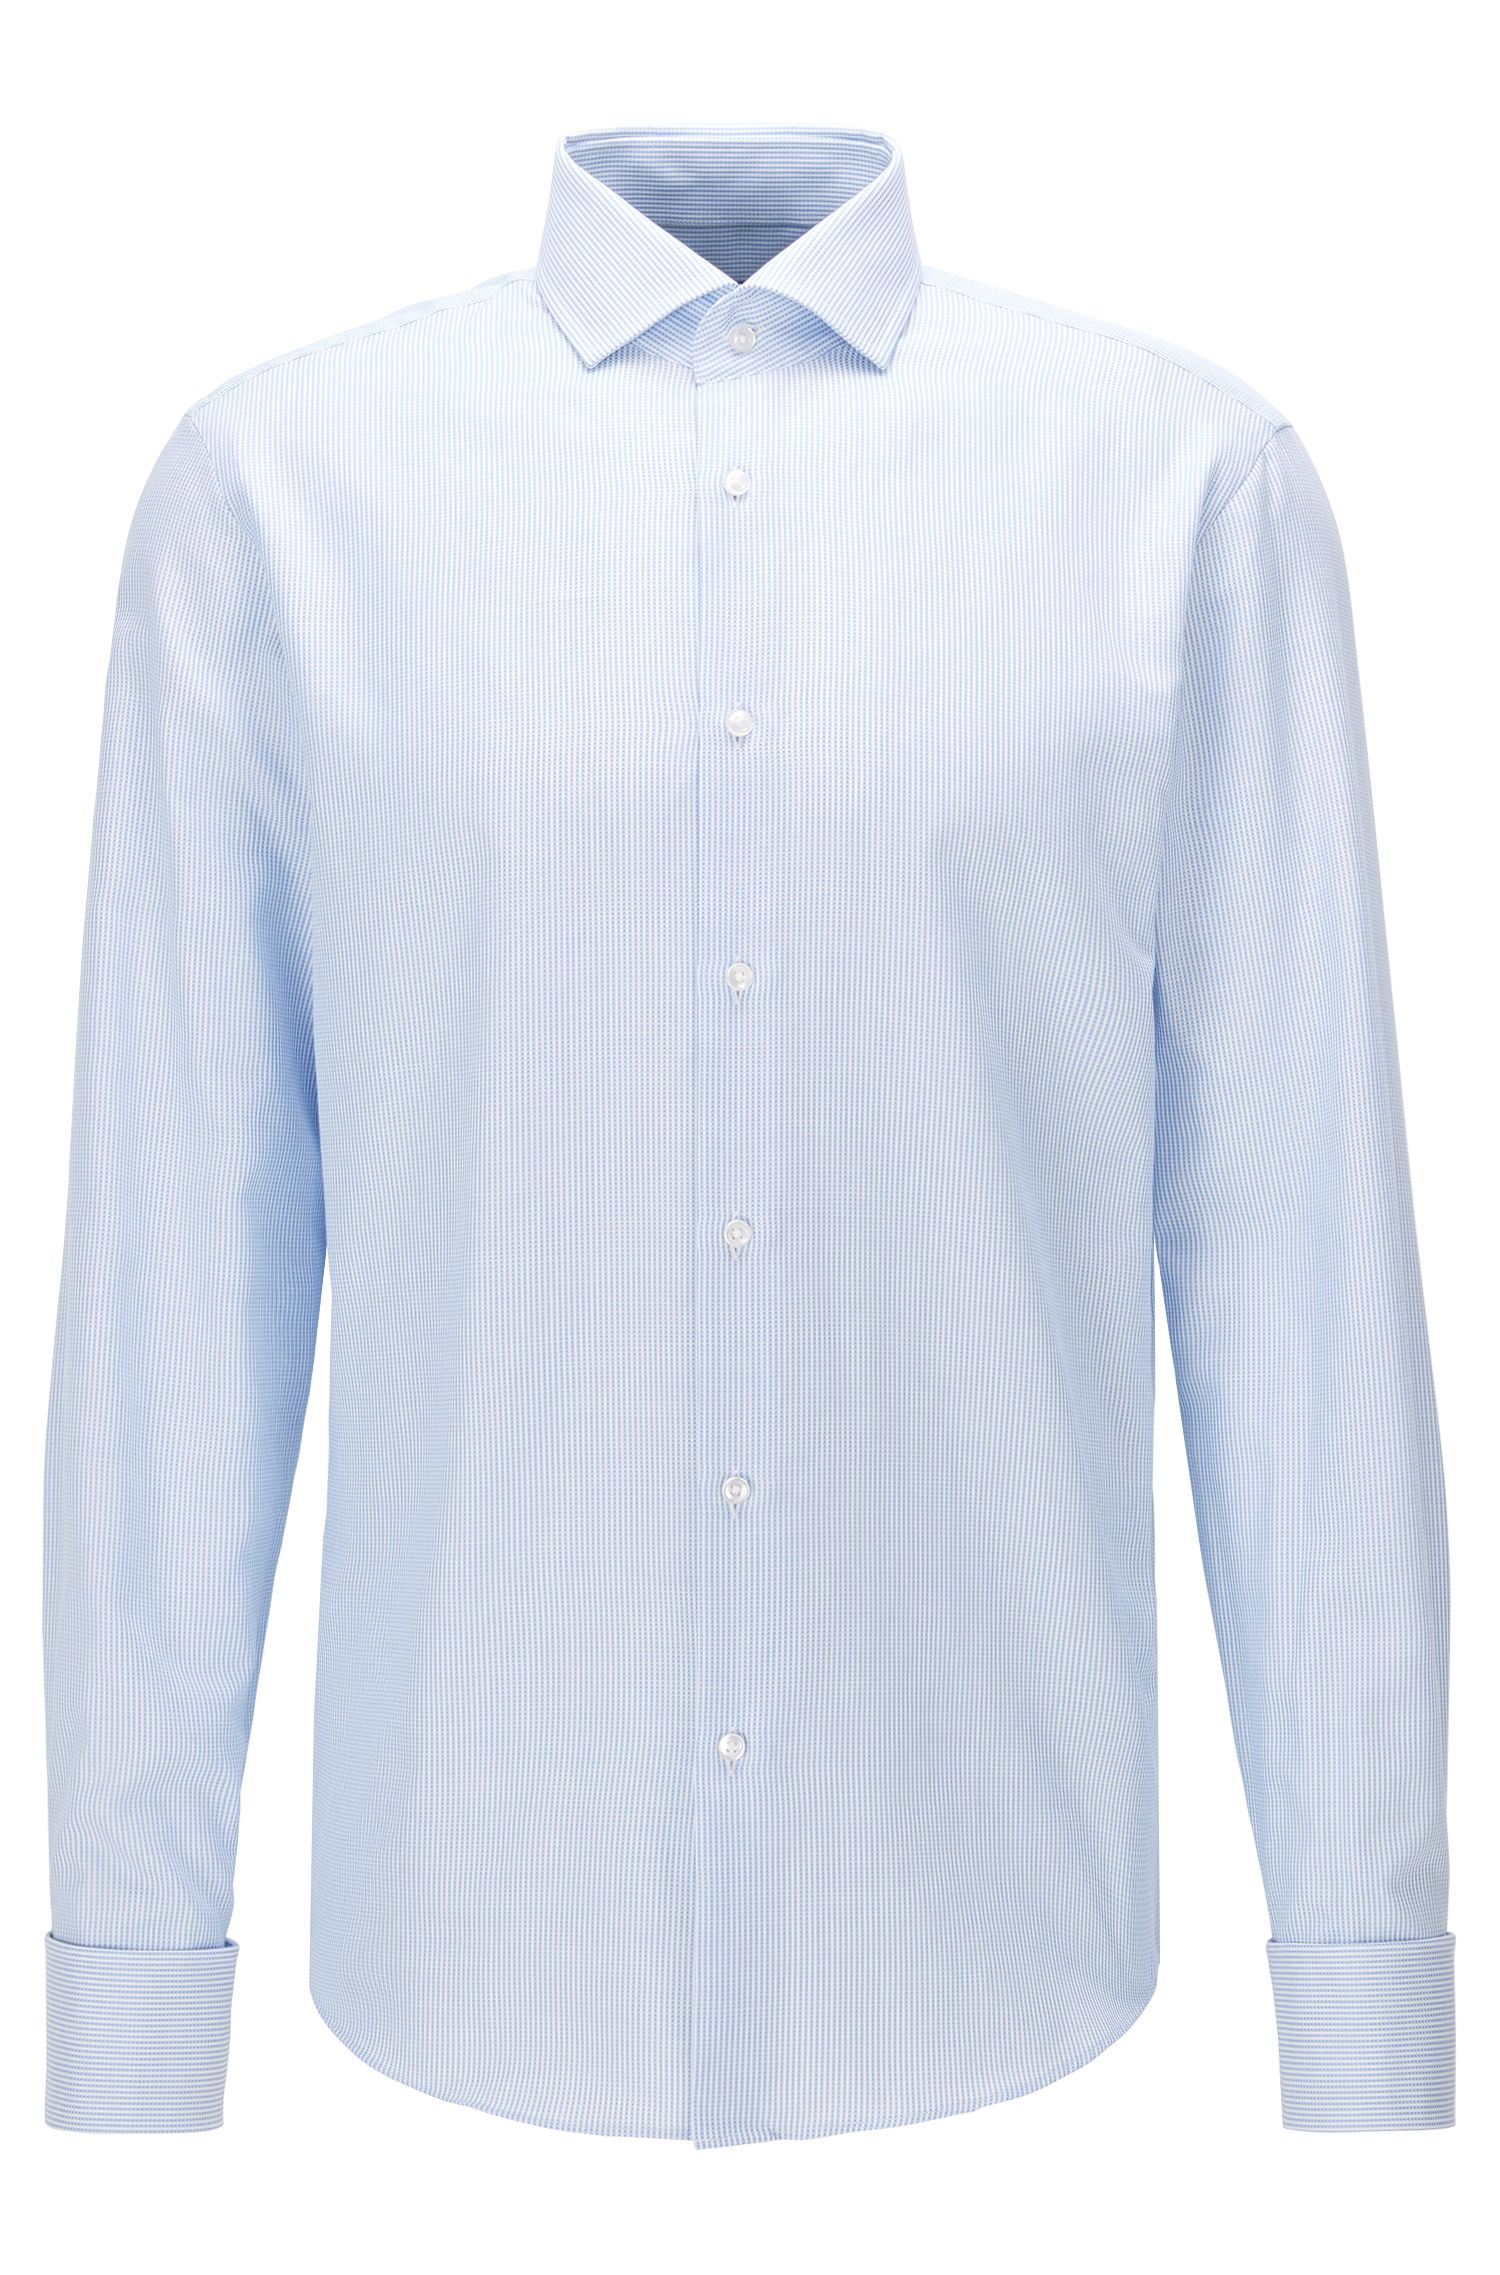 Dobby Cotton Dress Shirt, Regular Fit | Gardner